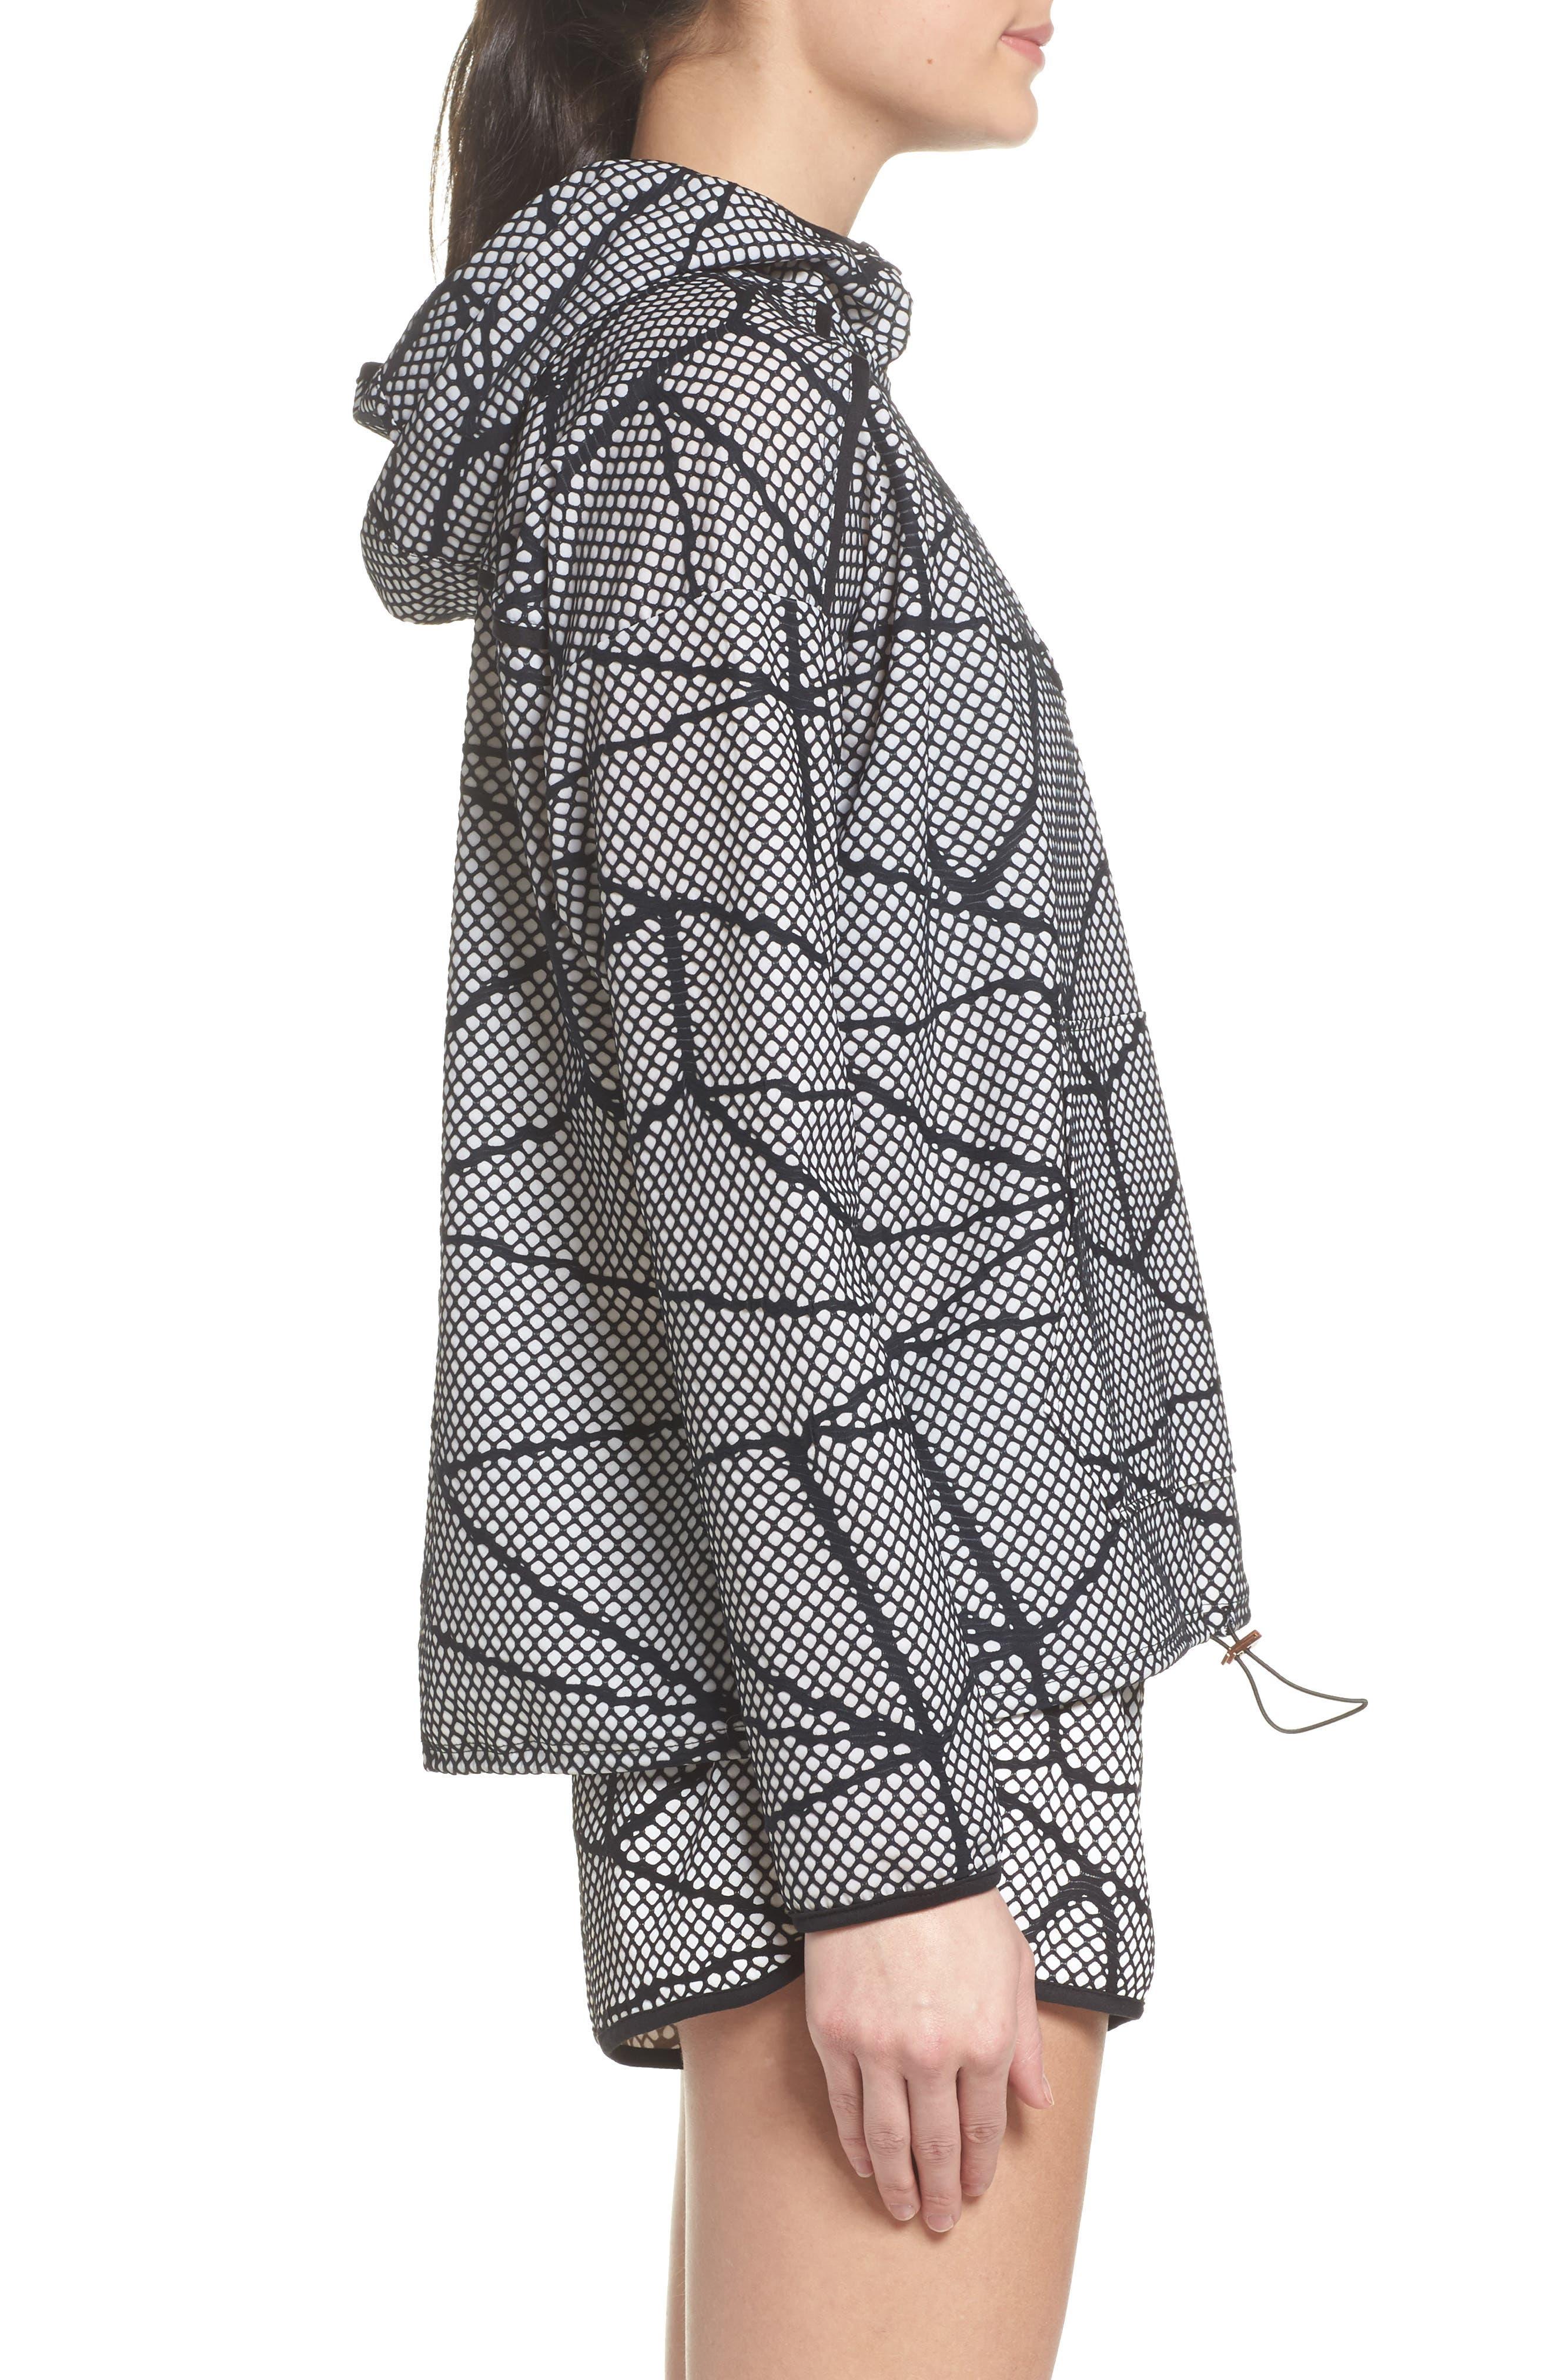 Chromatic Hoodie Pullover,                             Alternate thumbnail 3, color,                             Black-White Chromatic